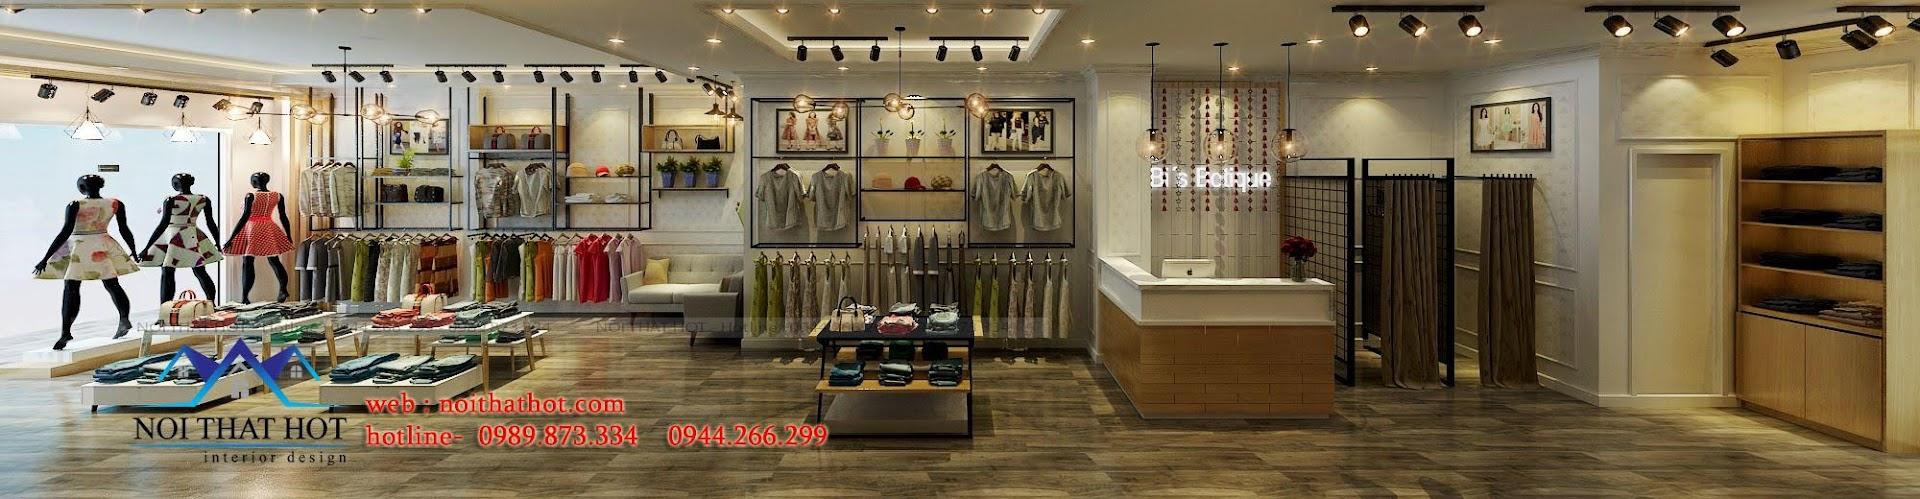 thiết kế shop thời trang nữ Bi's Boutique 10